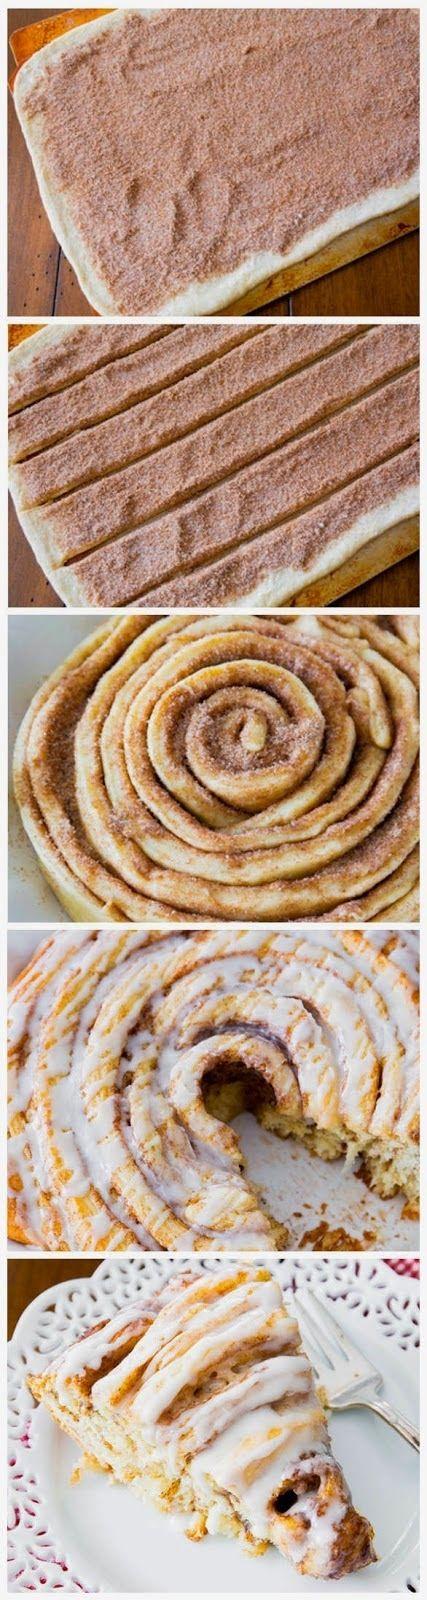 Giant Cinnamon Roll Cake Recipe